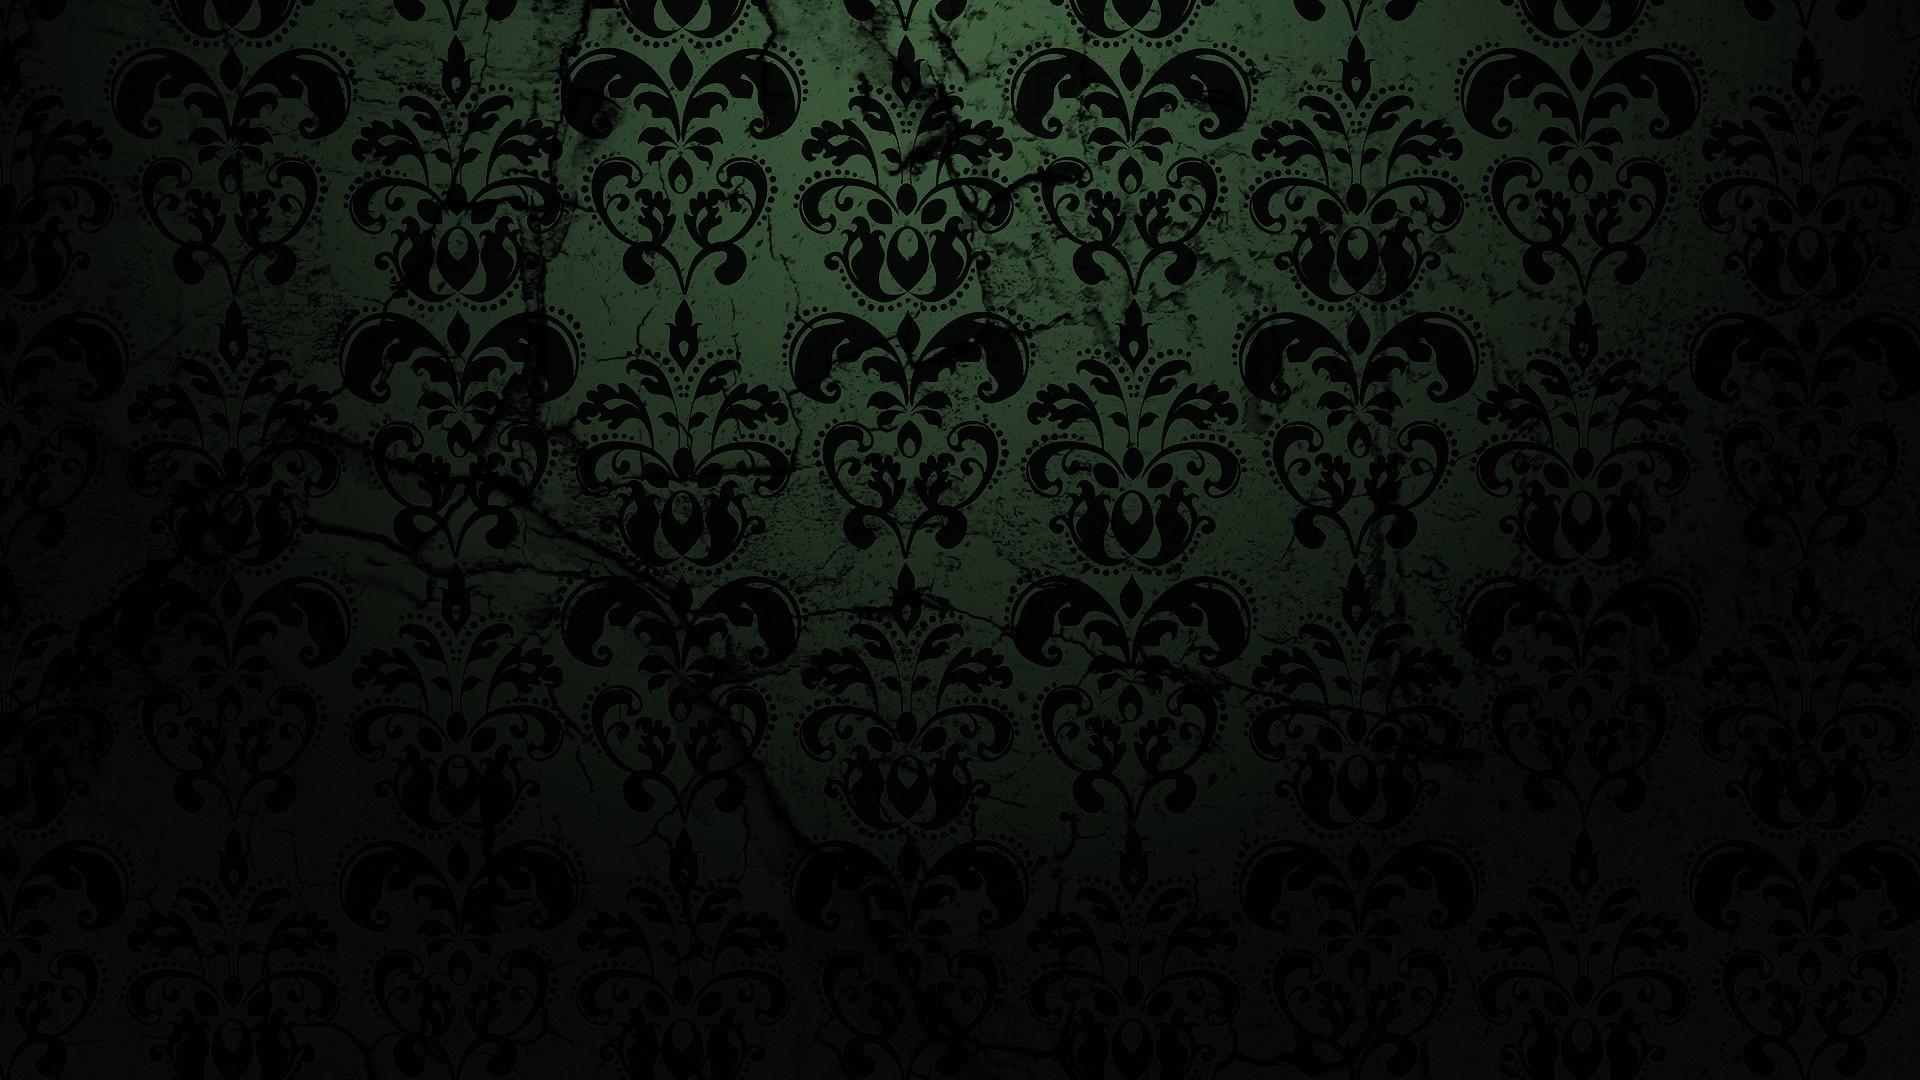 Vintage wall pattern wallpaper 4417 1920x1080